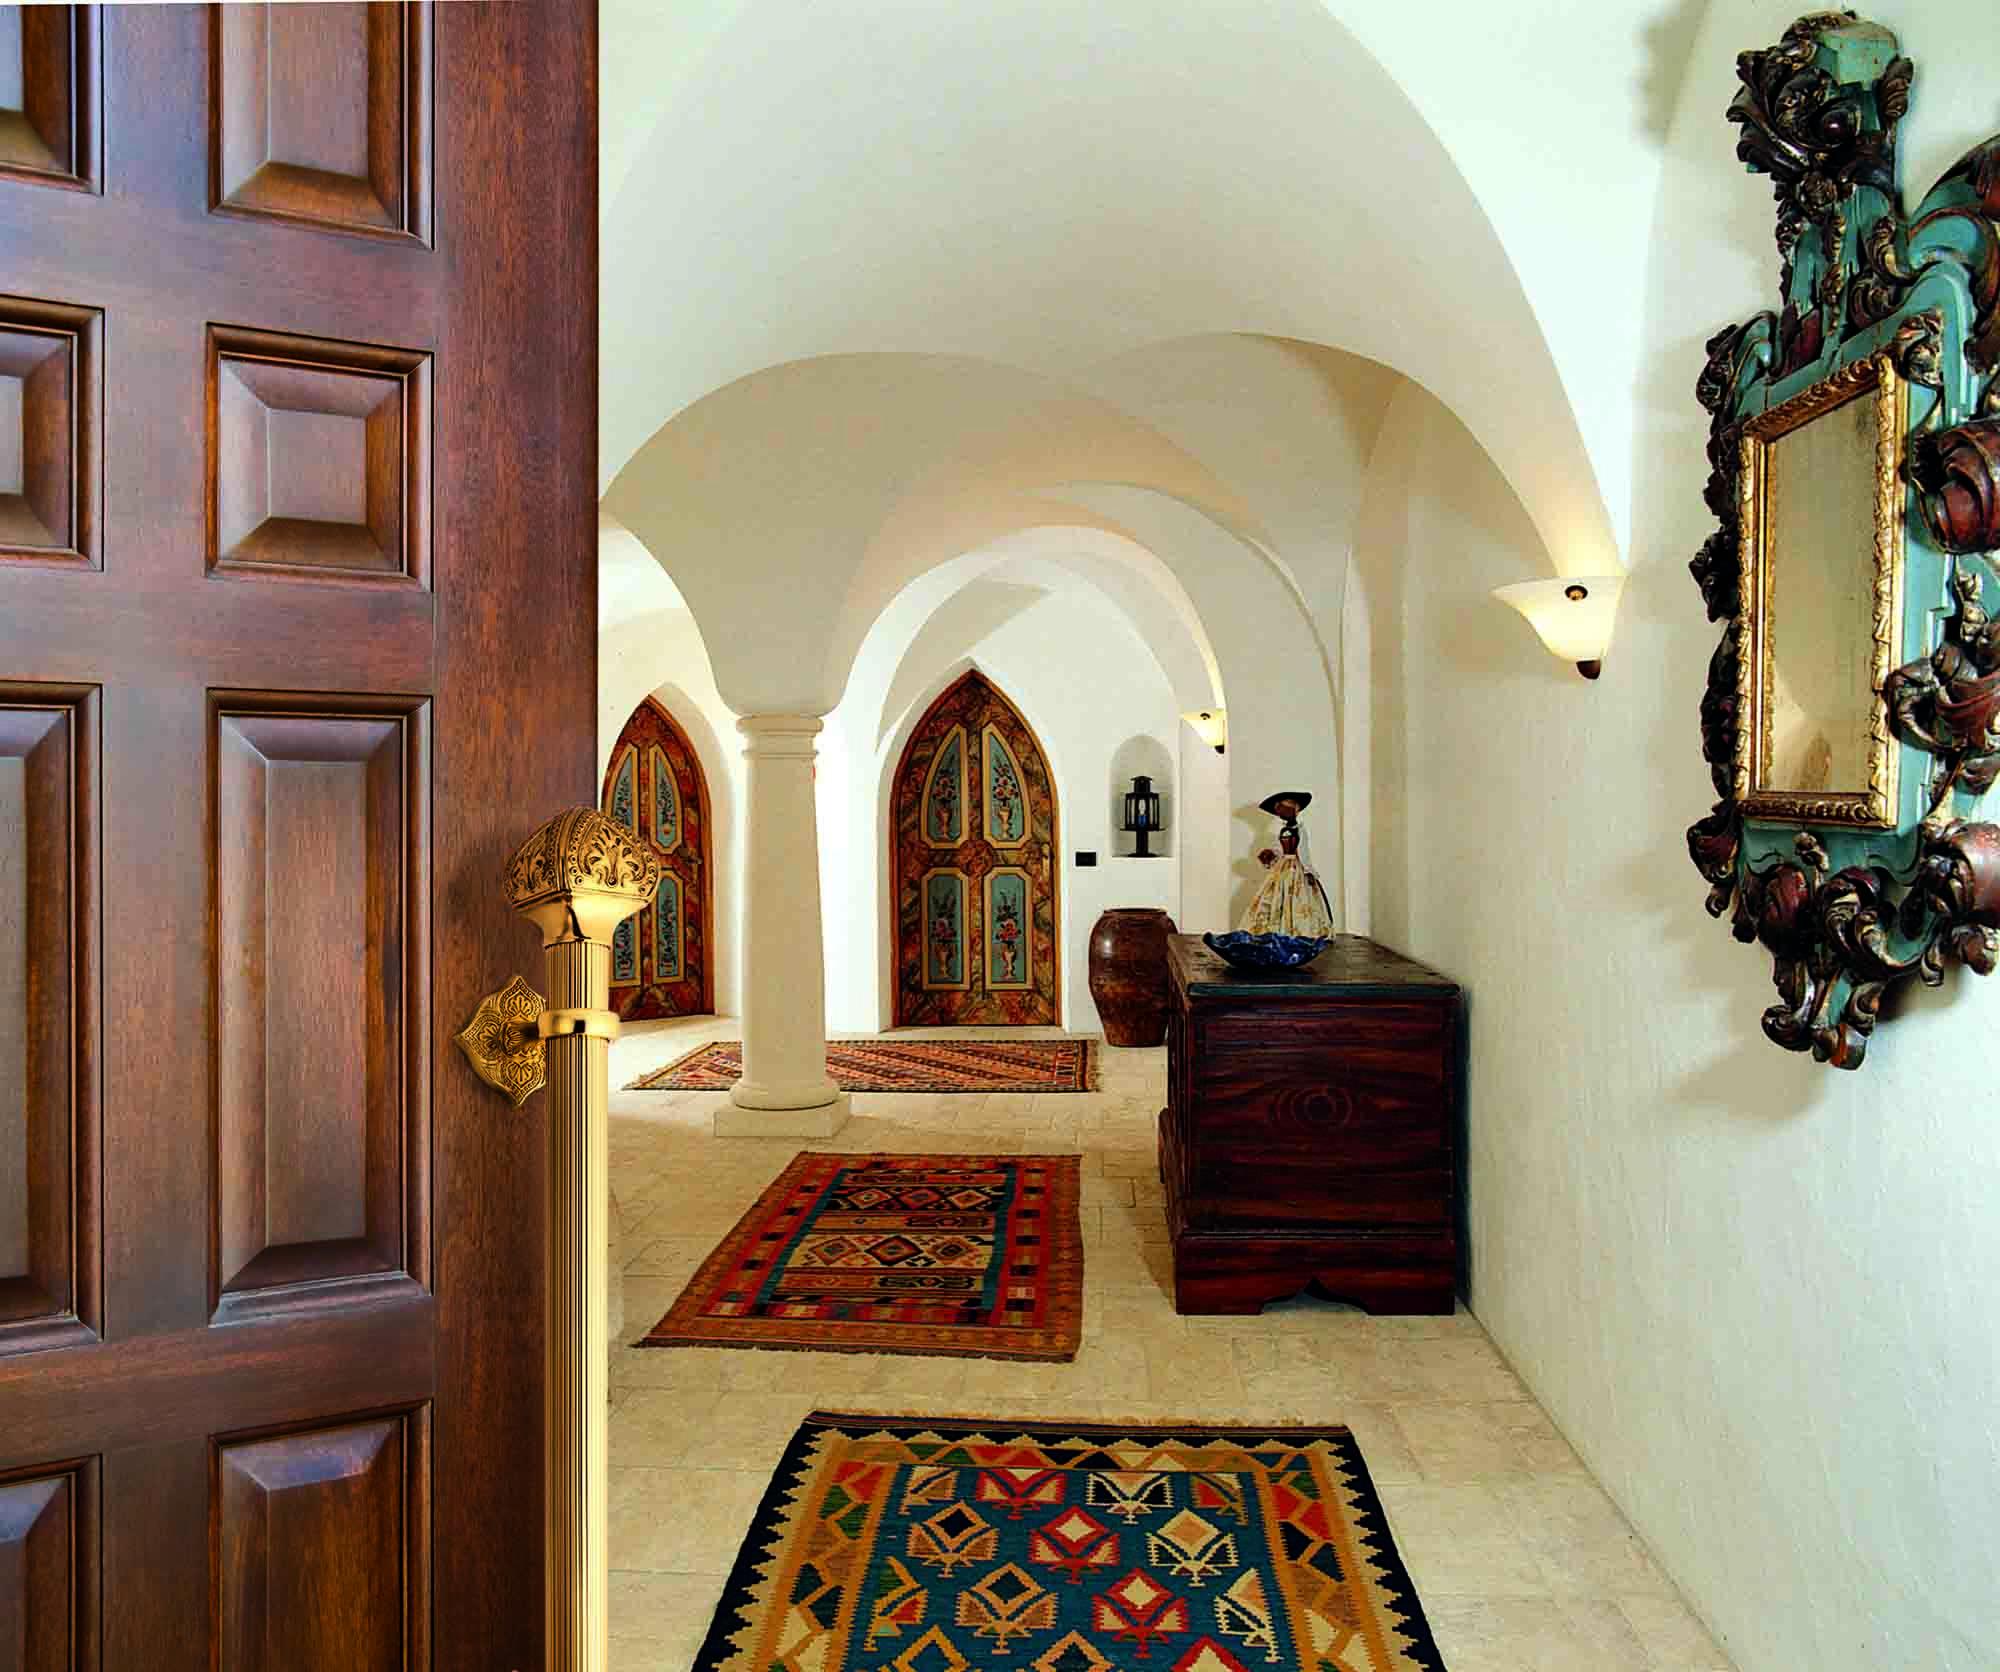 #handles #doors #maniglia #porta #first #Empire #Primo #Impero #living #design #madeinItaly #classic #collection #interior #luxury #home #lusso